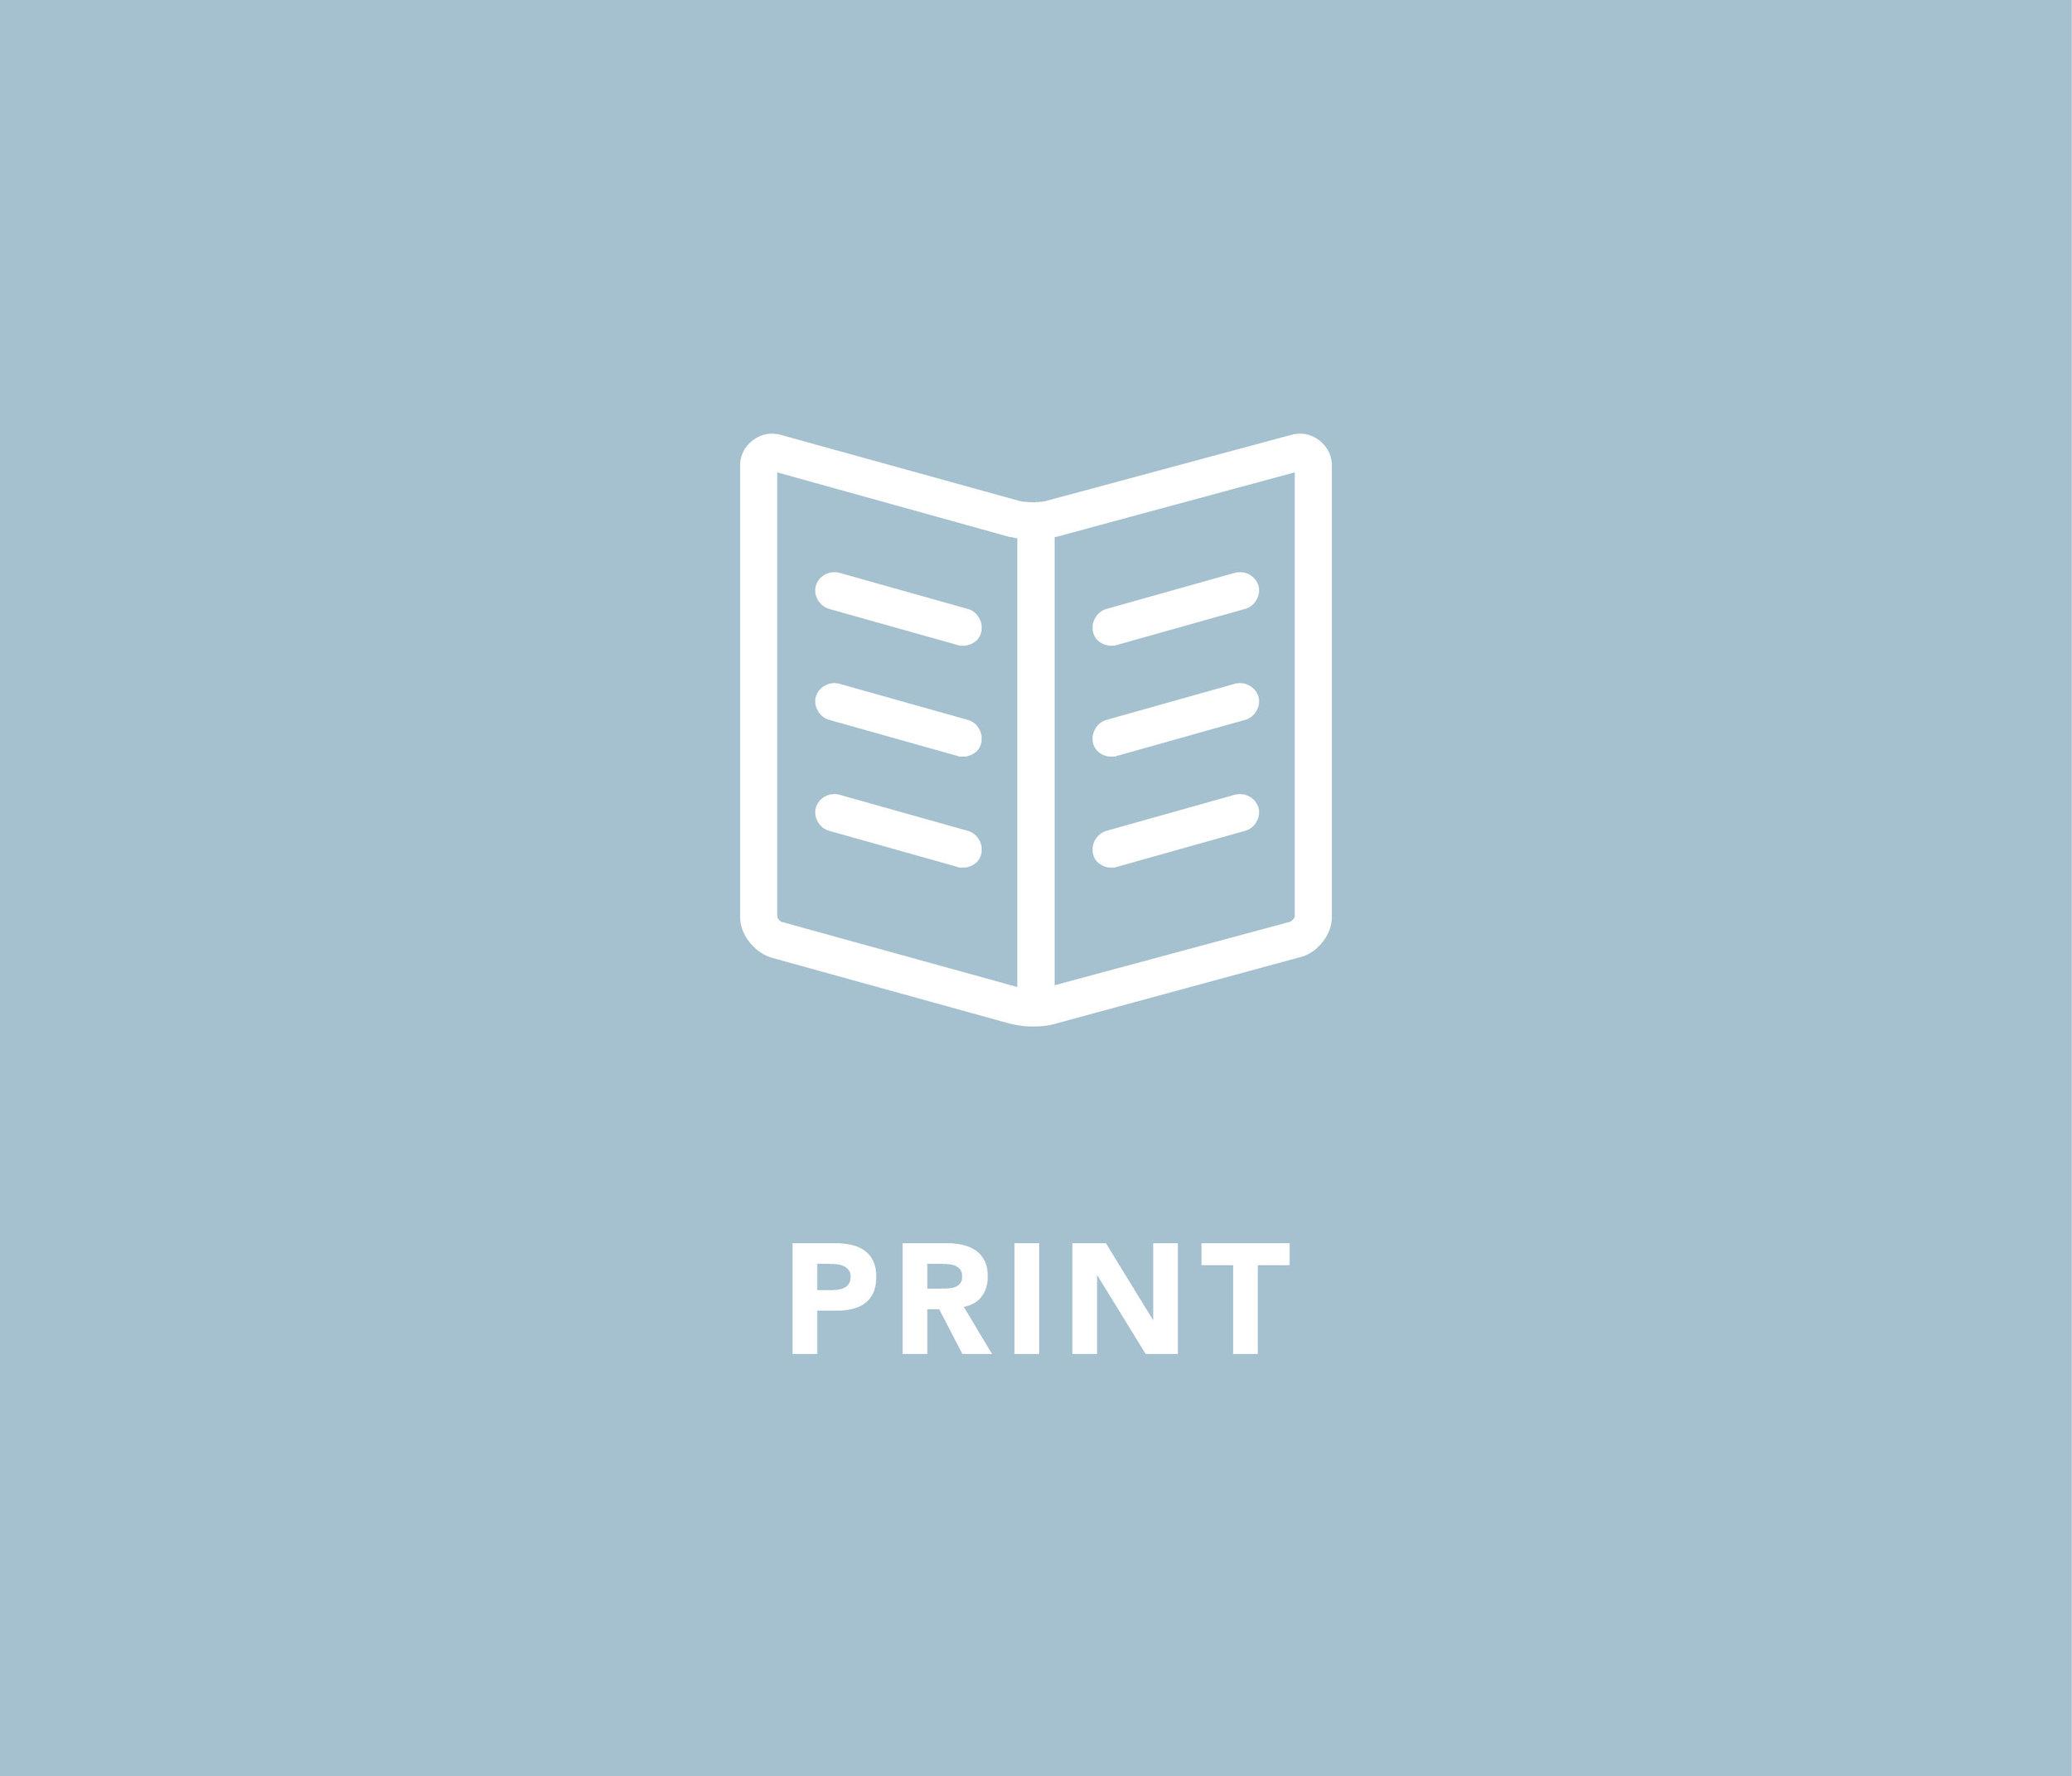 Print-icon.jpg